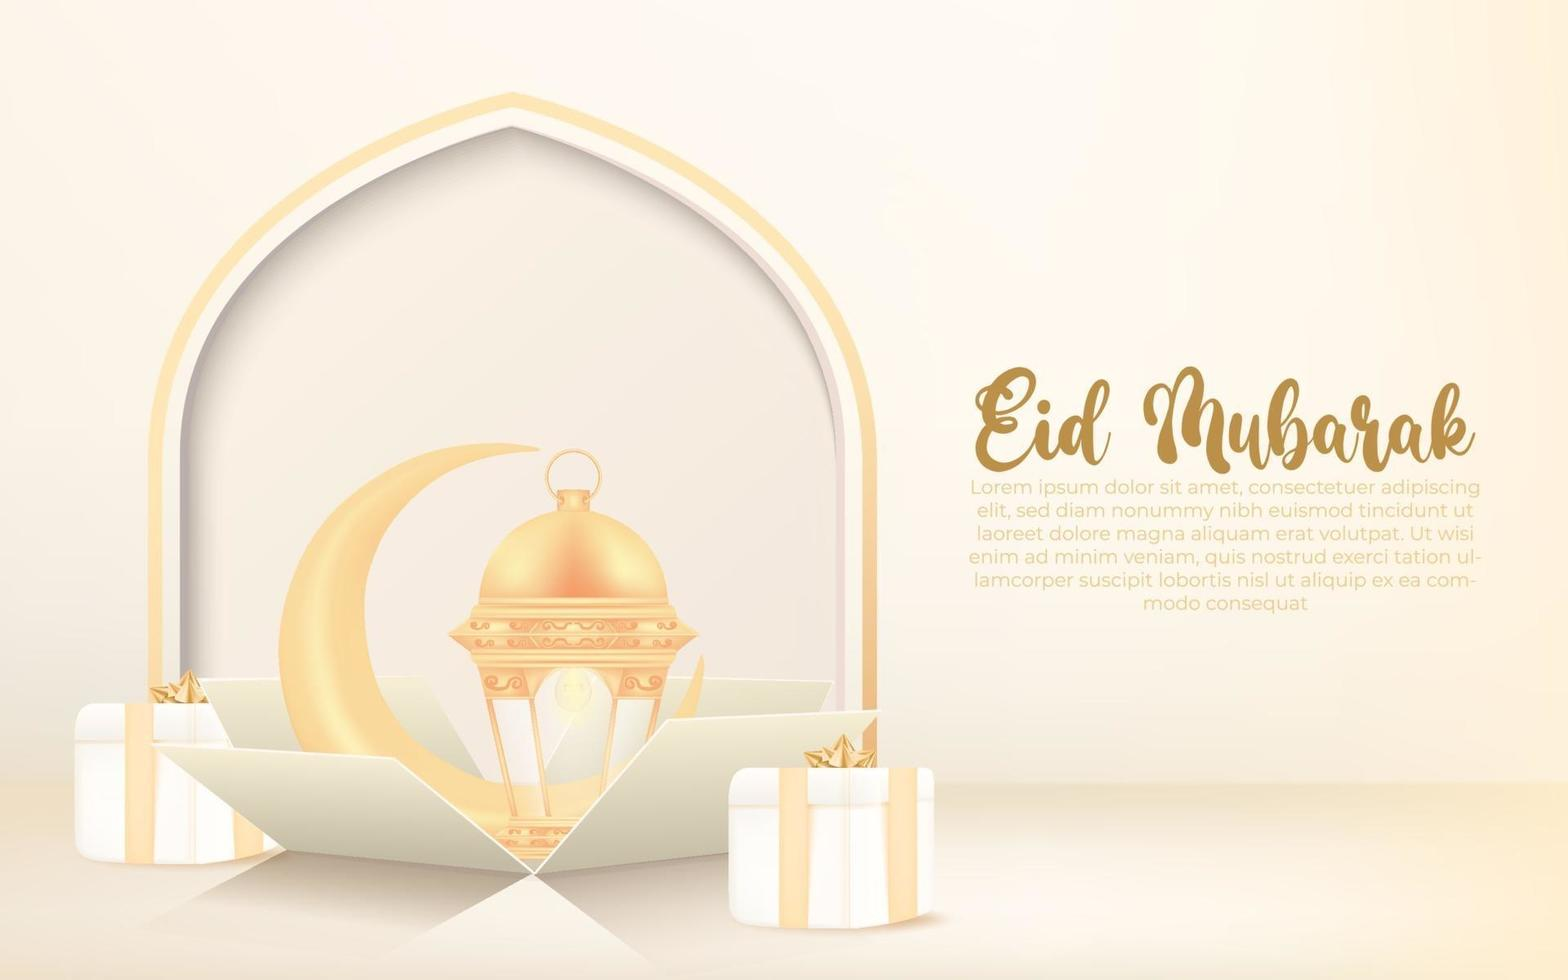 eid al-fitr background with crescent, lantern and gift box. eid mubarak banner celebration design concept. vector